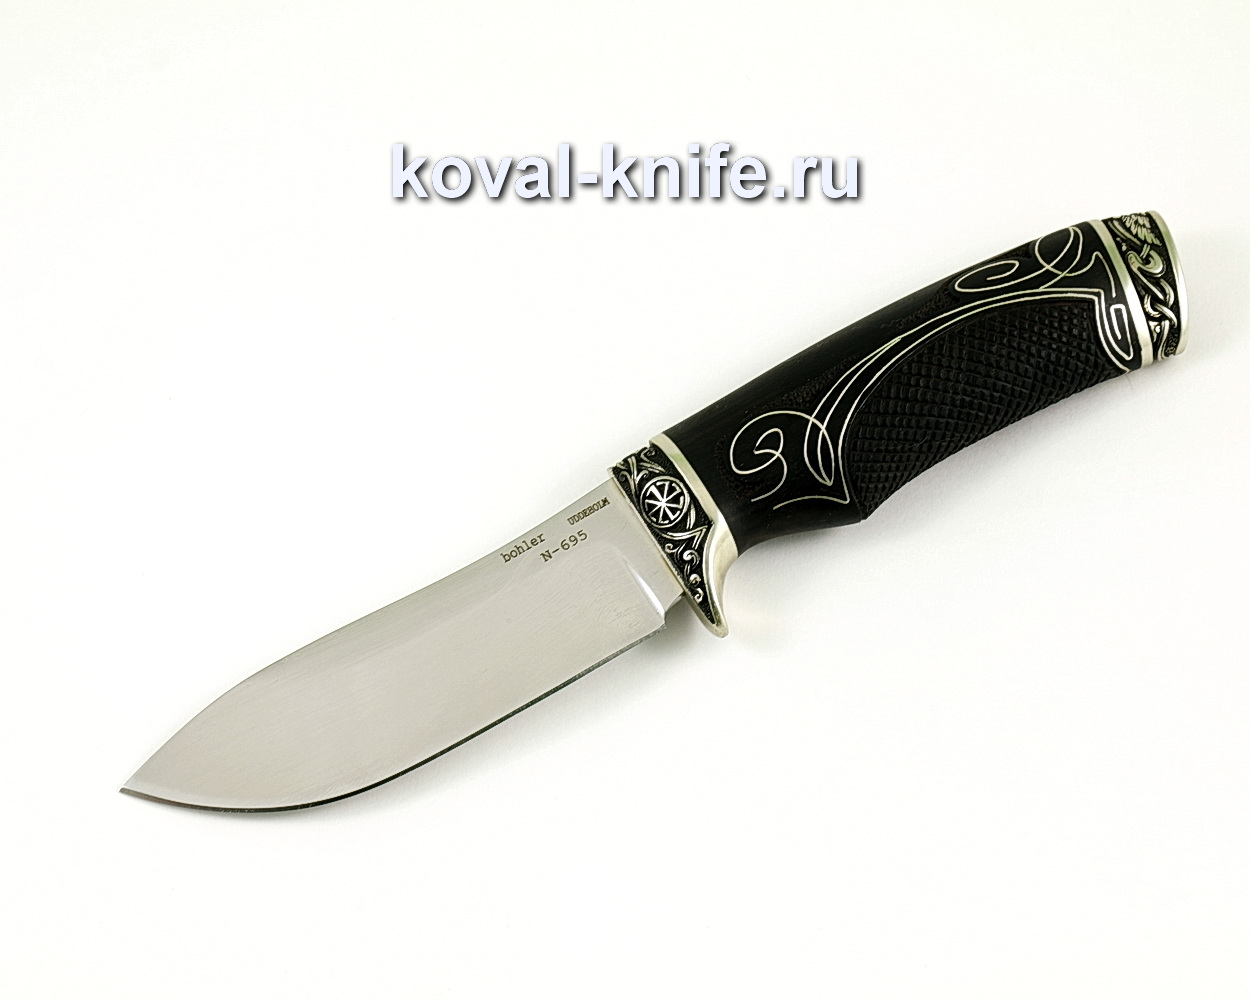 Нож Кабан из нержавеющей стали Bohler N695, (рукоять граб с инкрустацией серебром) A388